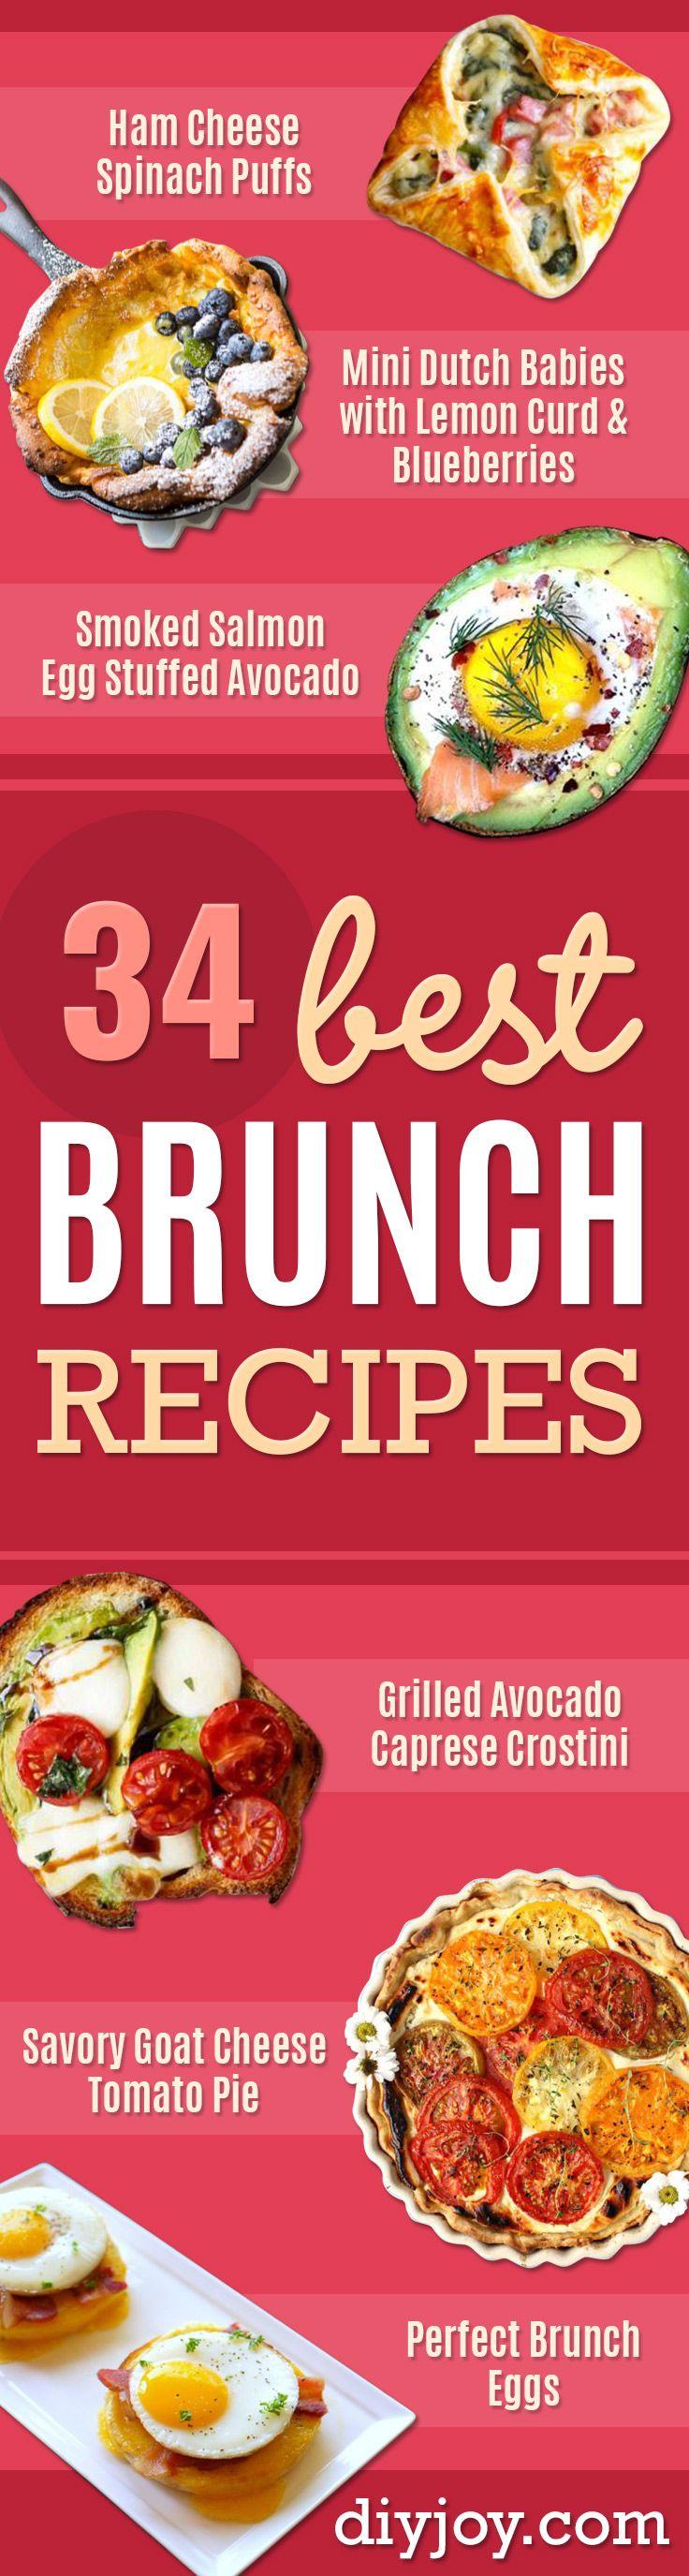 Best Brunch Recipes  Eggs, Pancakes, Waffles, Casseroles, Vegetable Dishes